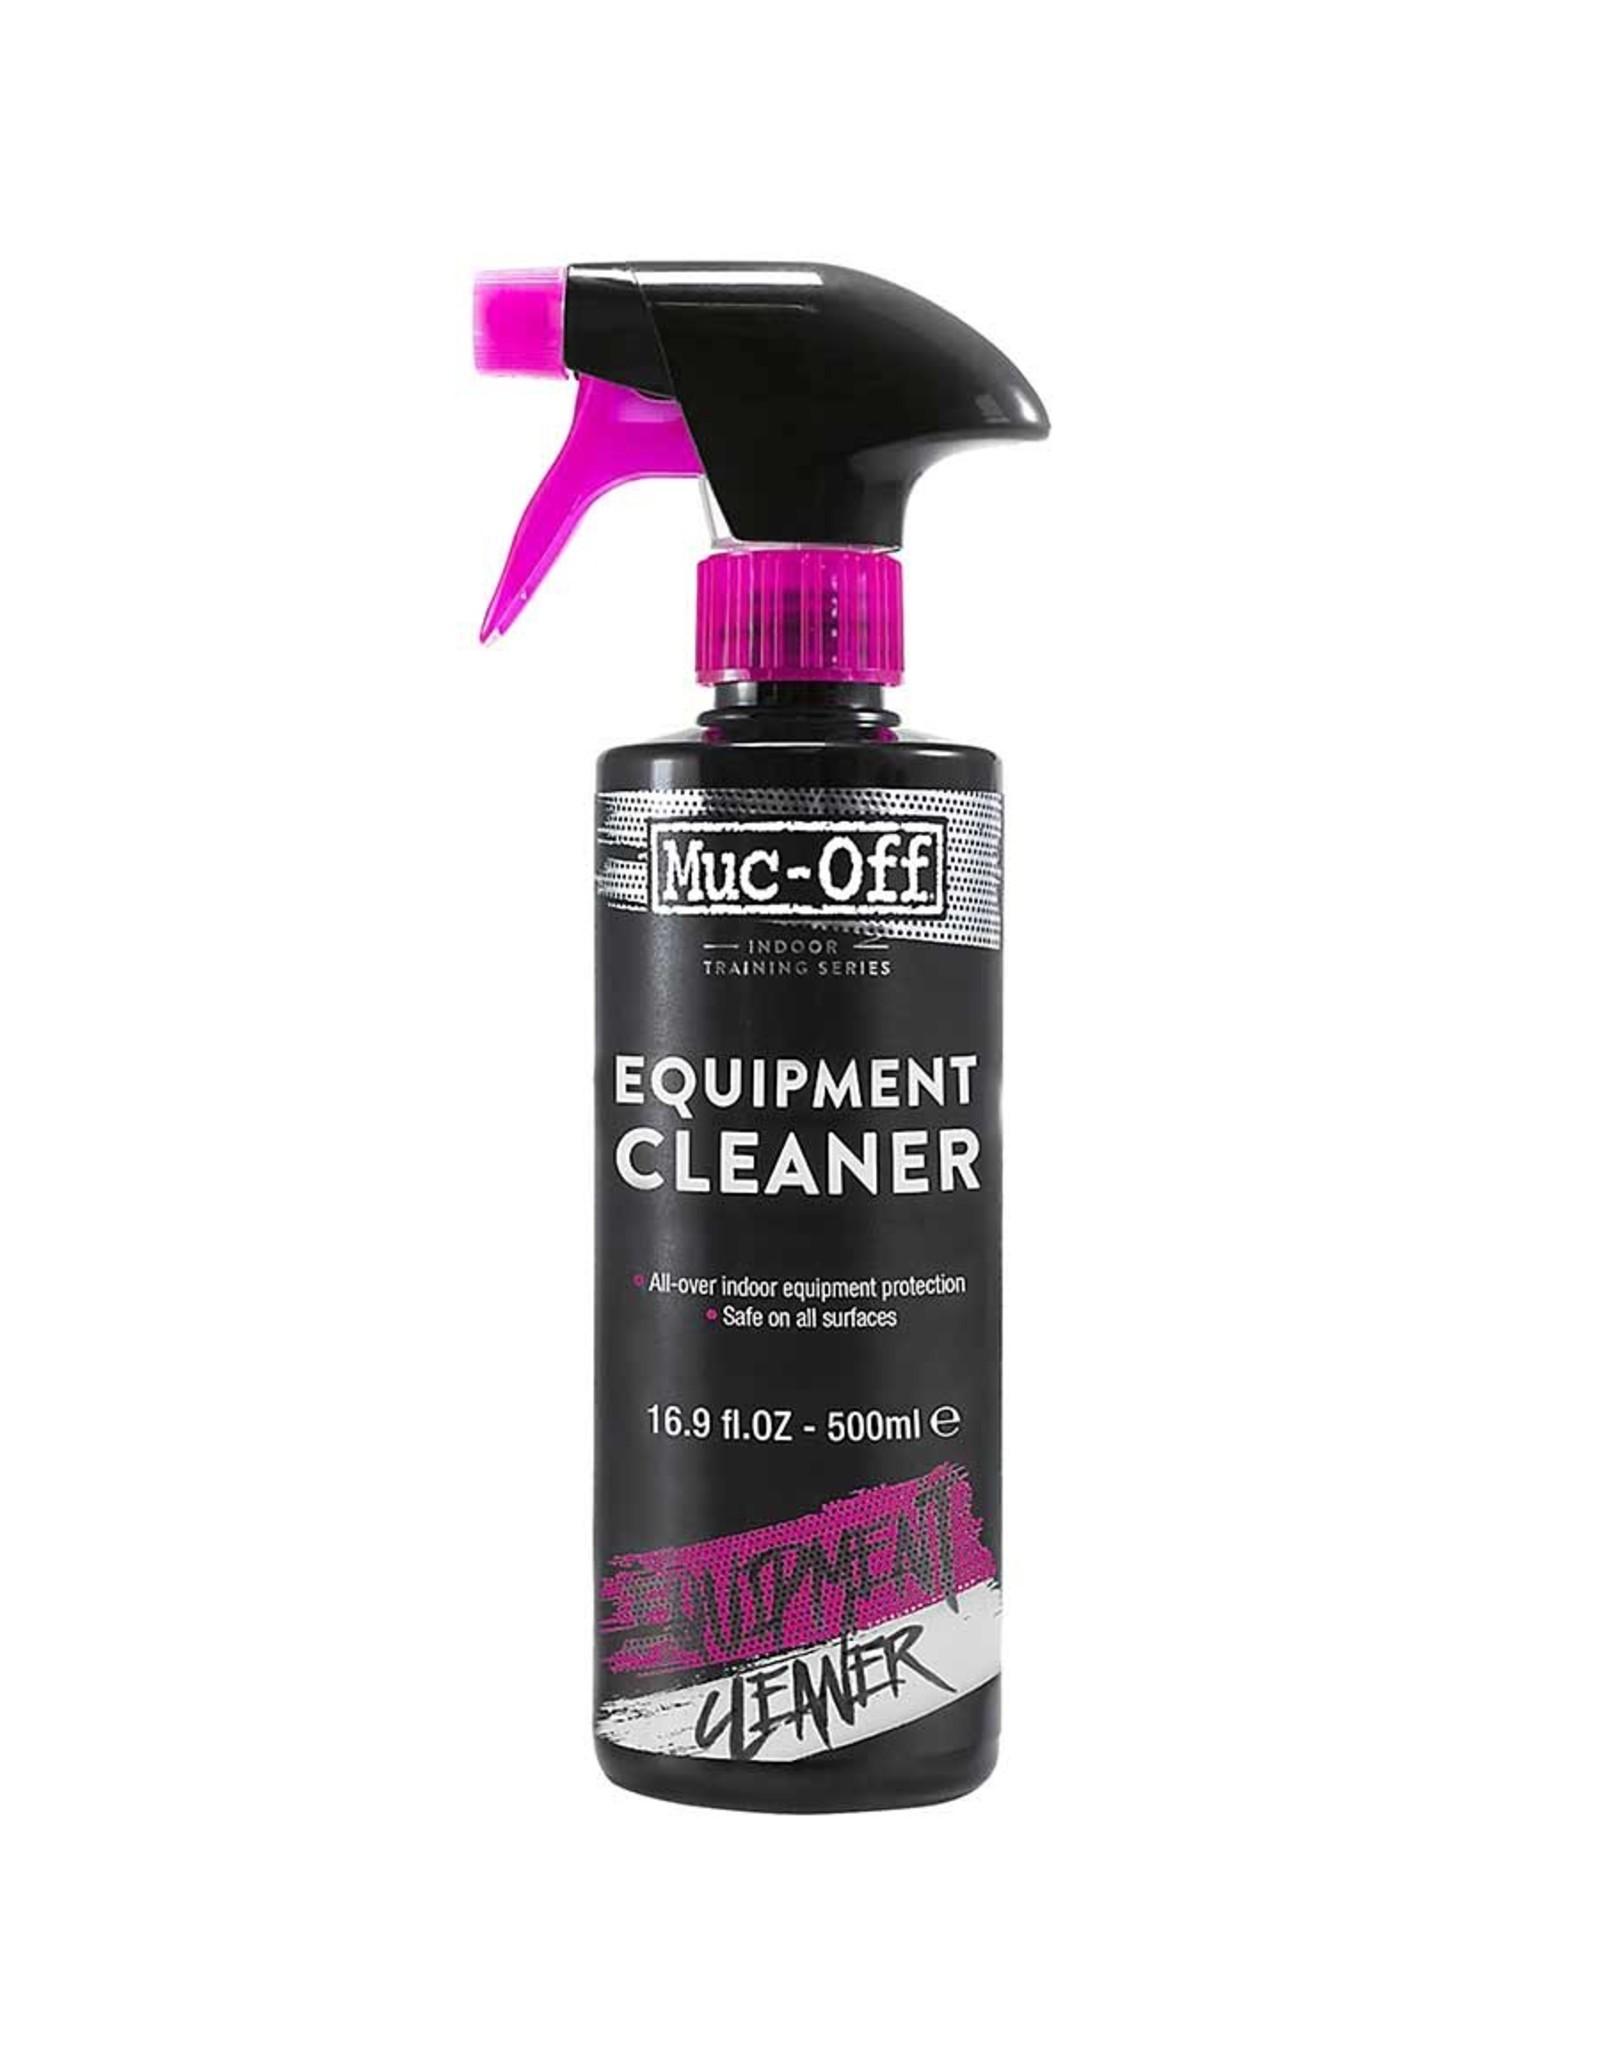 Muc-Off Muc Off - Equipment Cleaner, 500ml